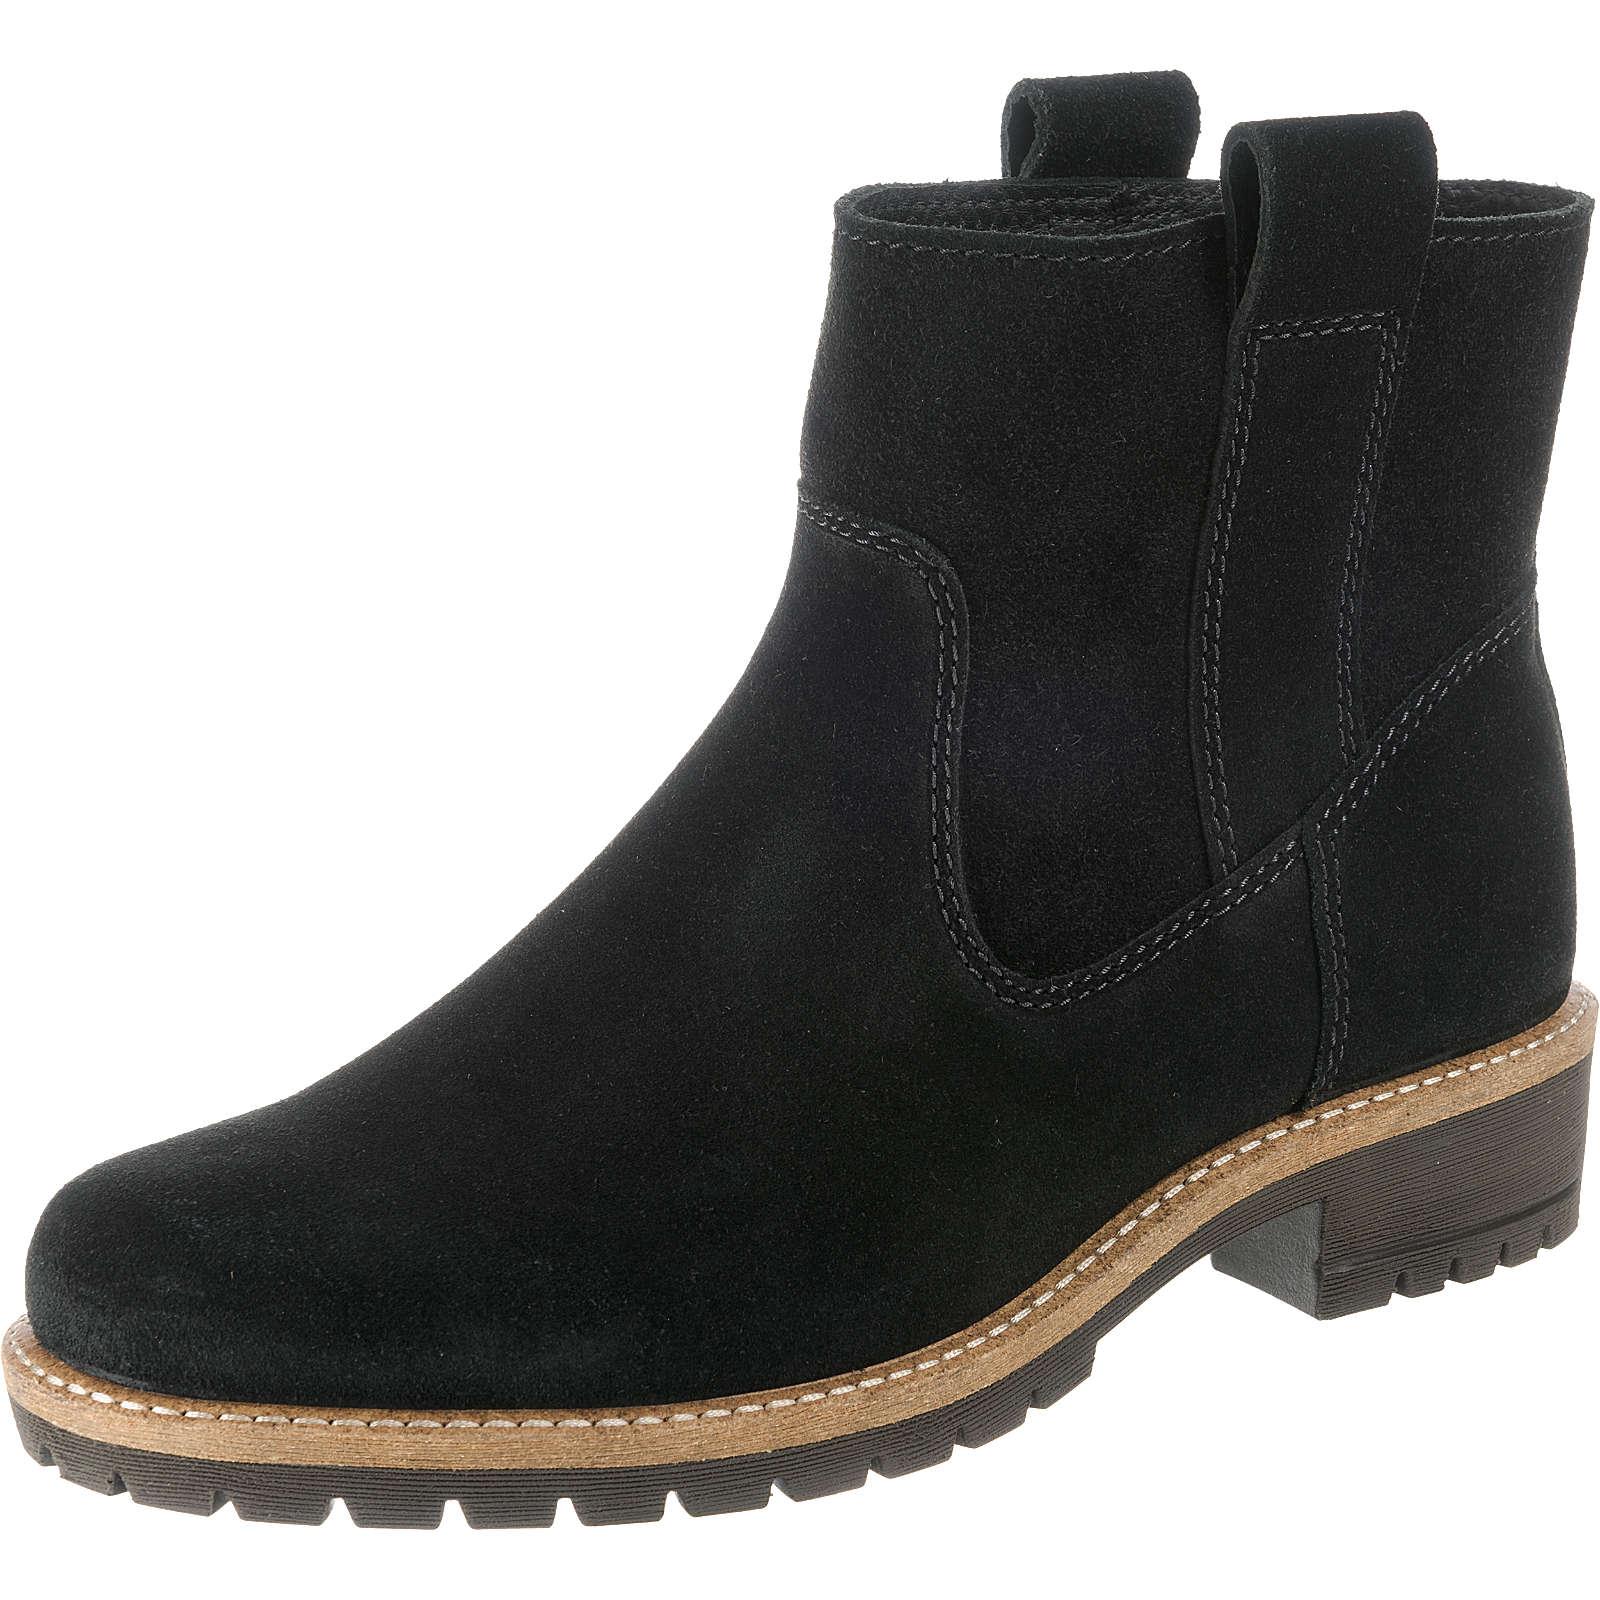 ecco Elaine Ankle Boots schwarz Damen Gr. 37